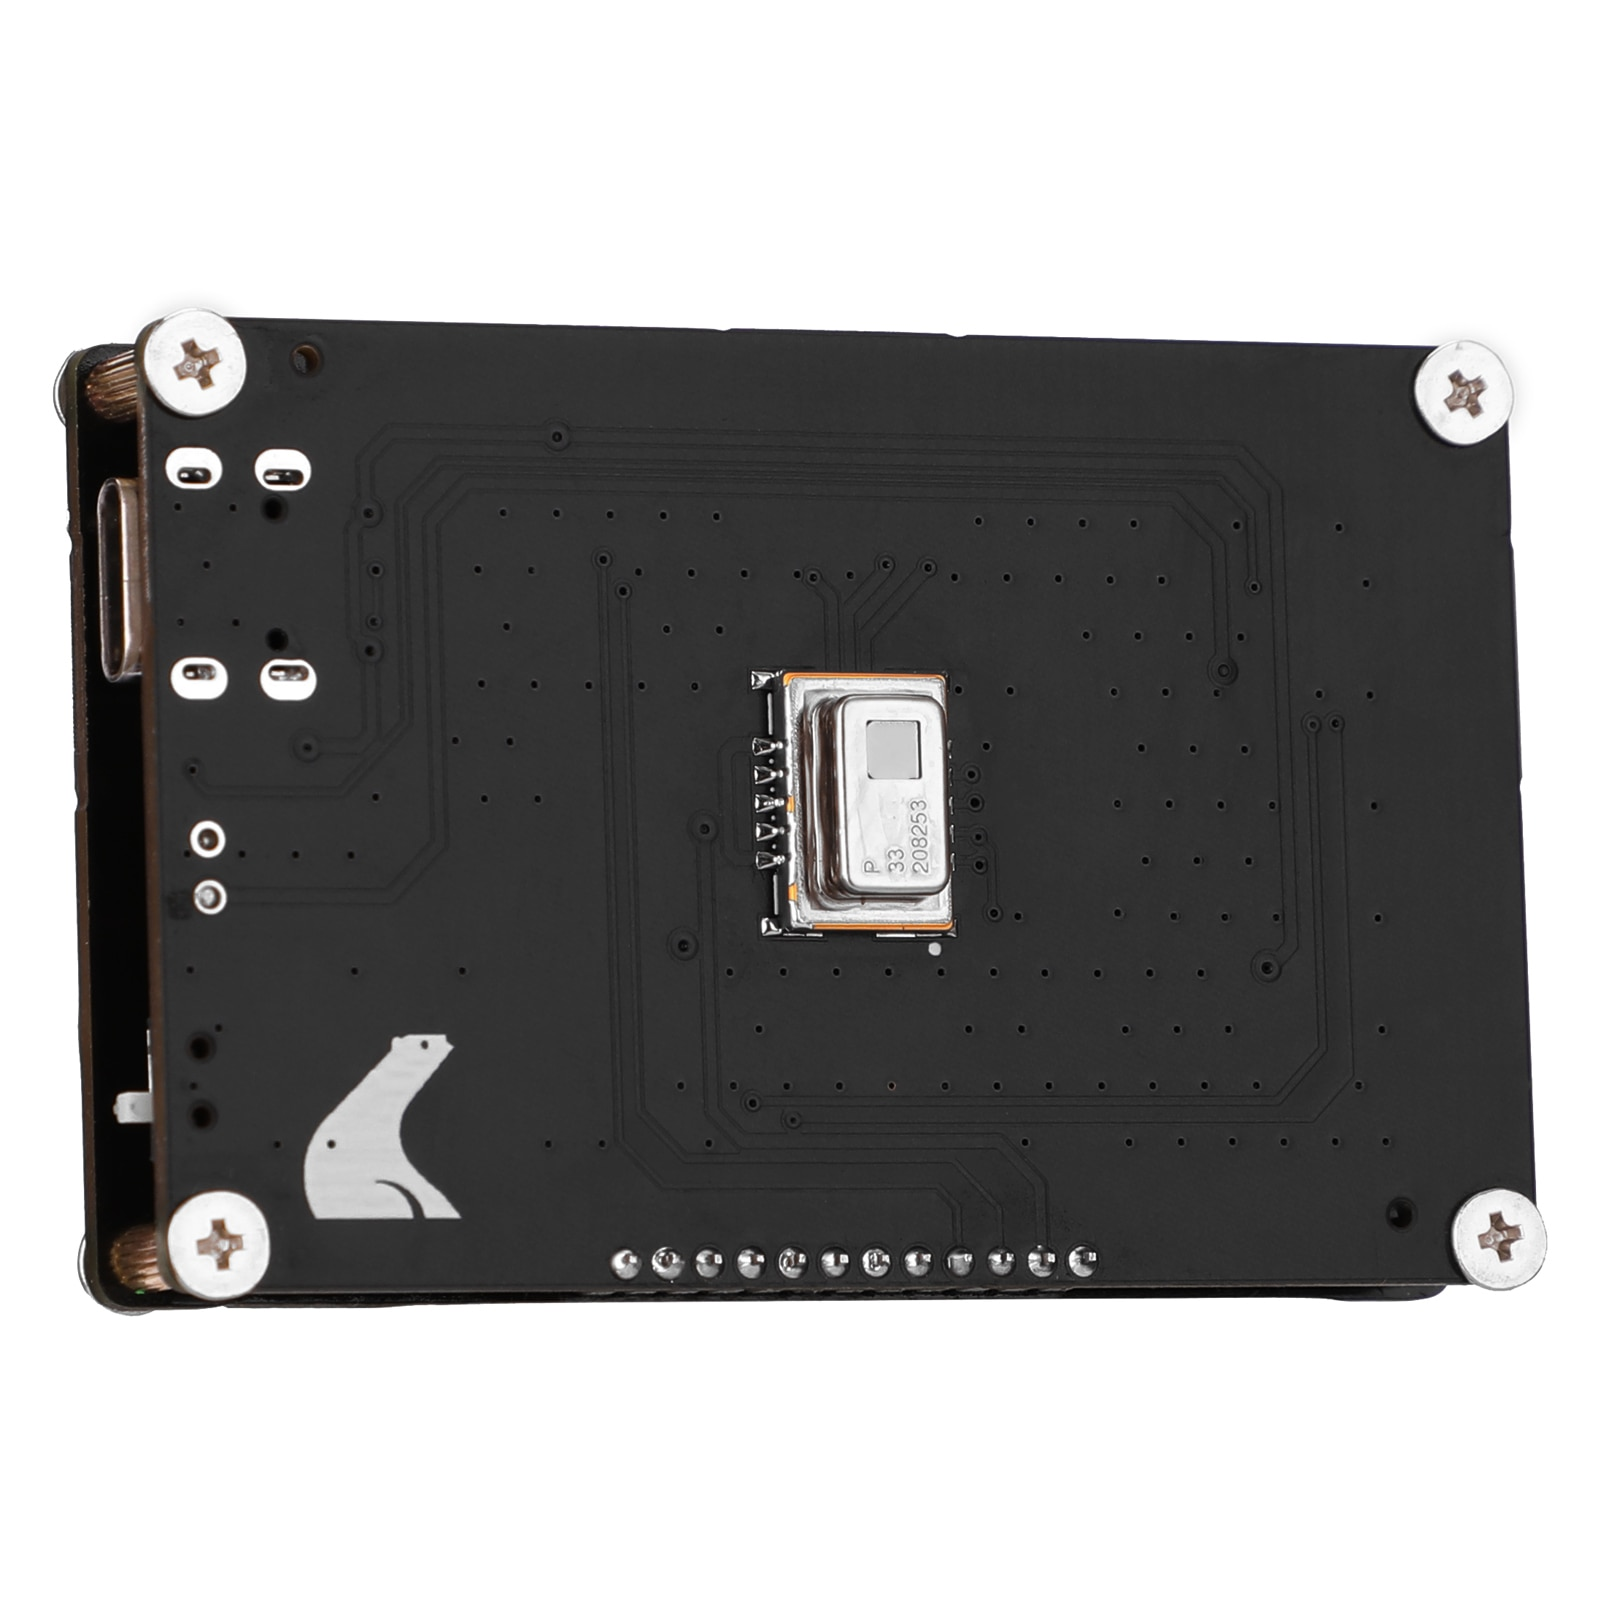 Infrared Thermal Imager AMG8833 Thermal Imaging Camera Temperature Sensors 1.6 Inch TFT Display Screen 10Hz Data Refresh Rate enlarge